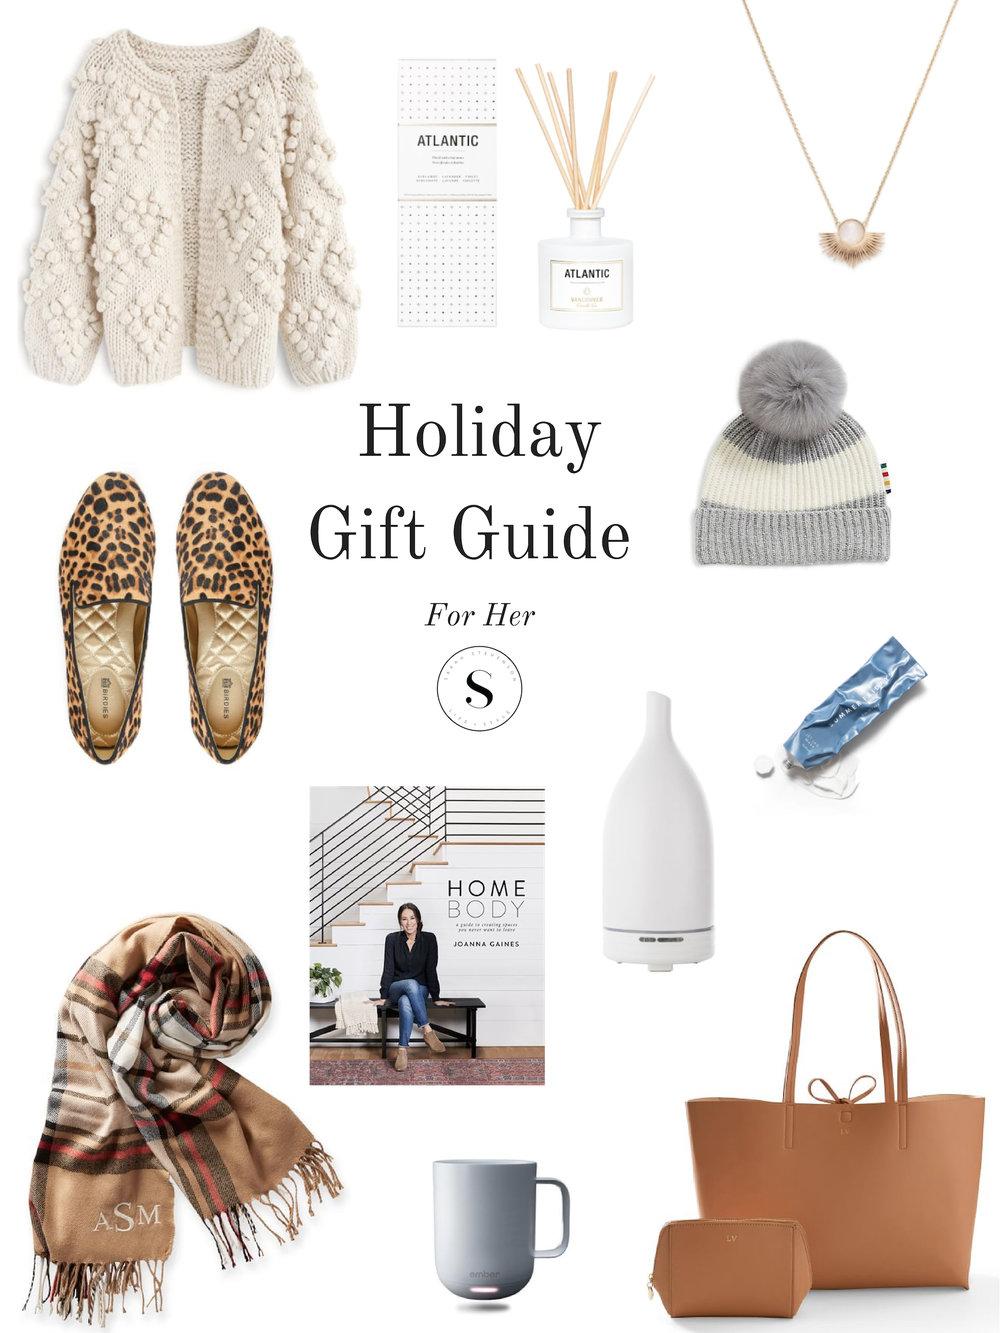 HolidayGift Guide (3).jpg